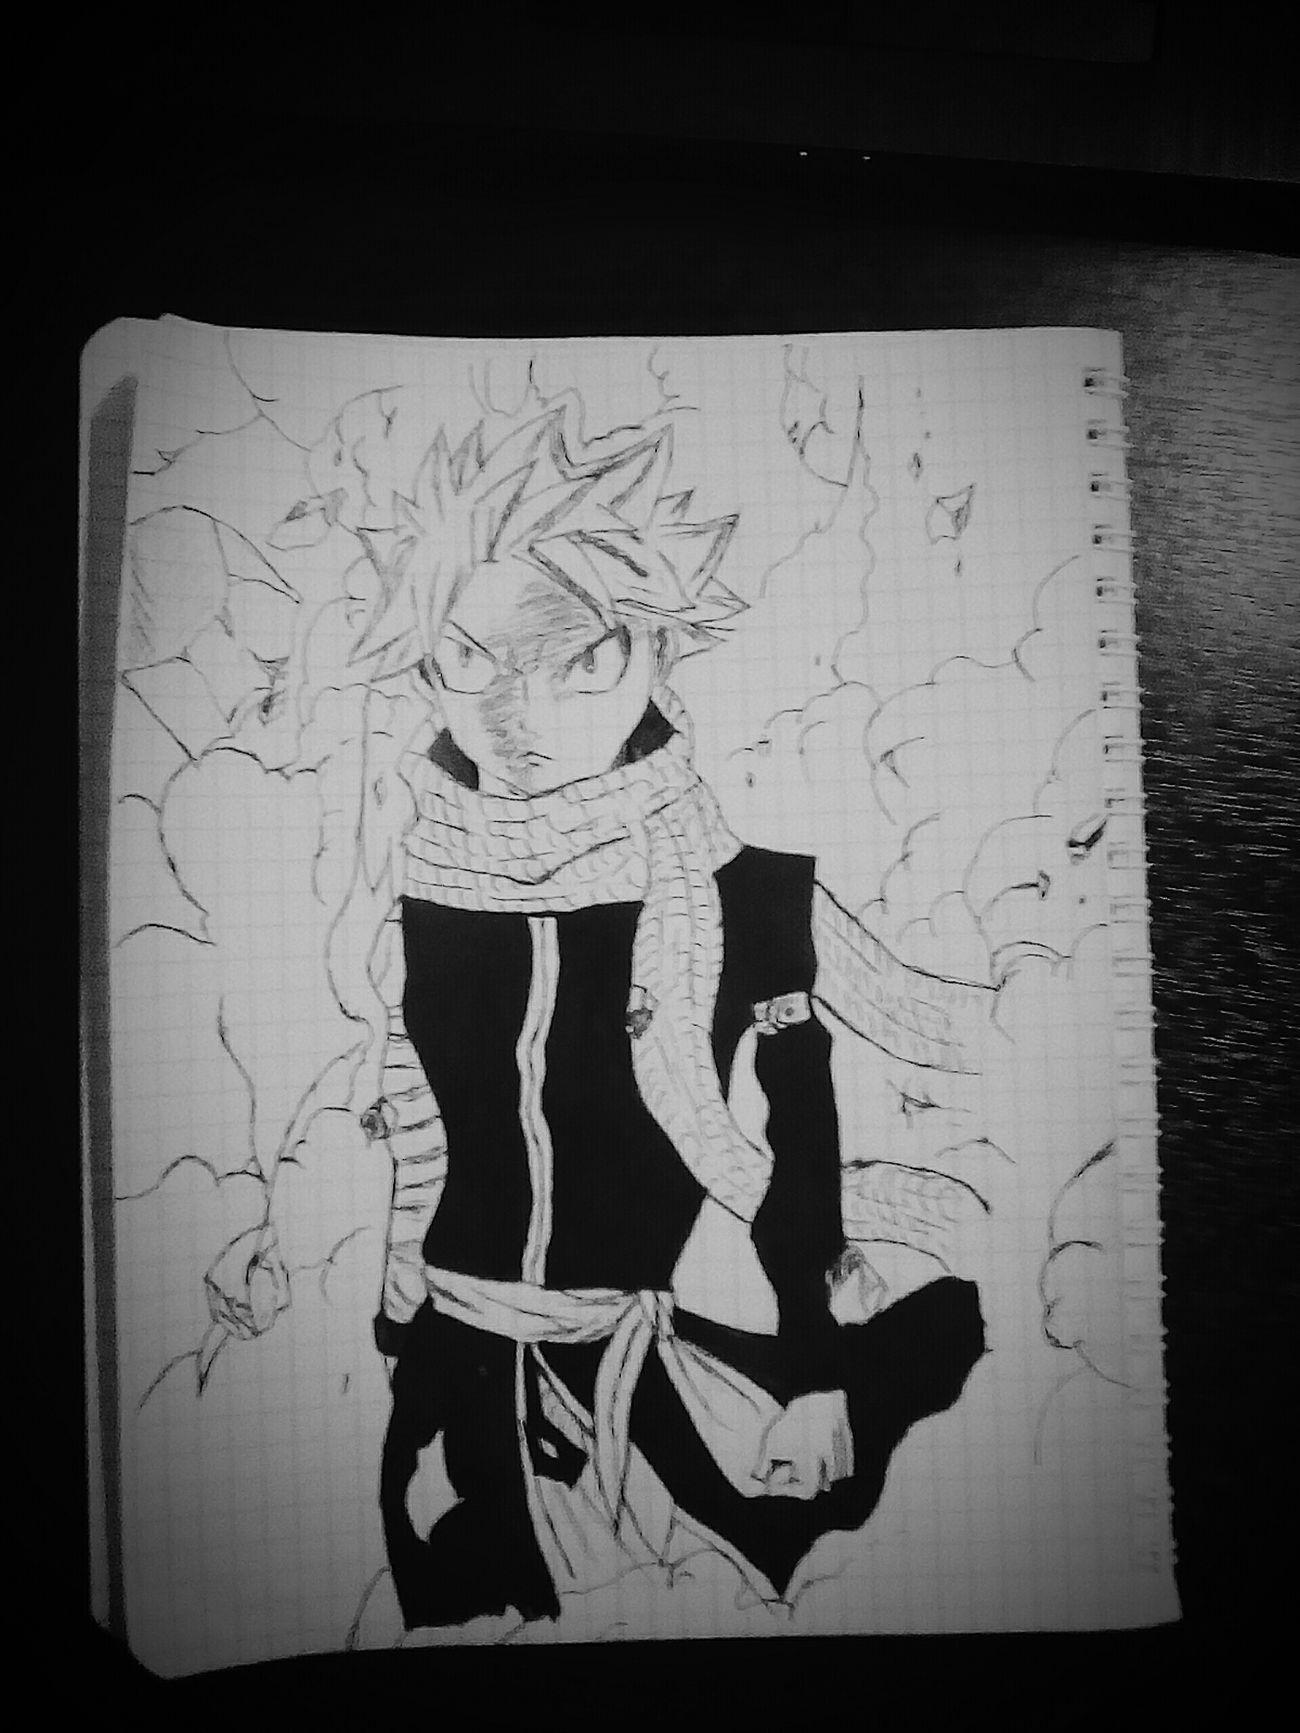 Anime Manga FairyTail Natsu Dragneel Art Picture Blackandwhite Немножко Нацу в ленту😊😝😺🎨